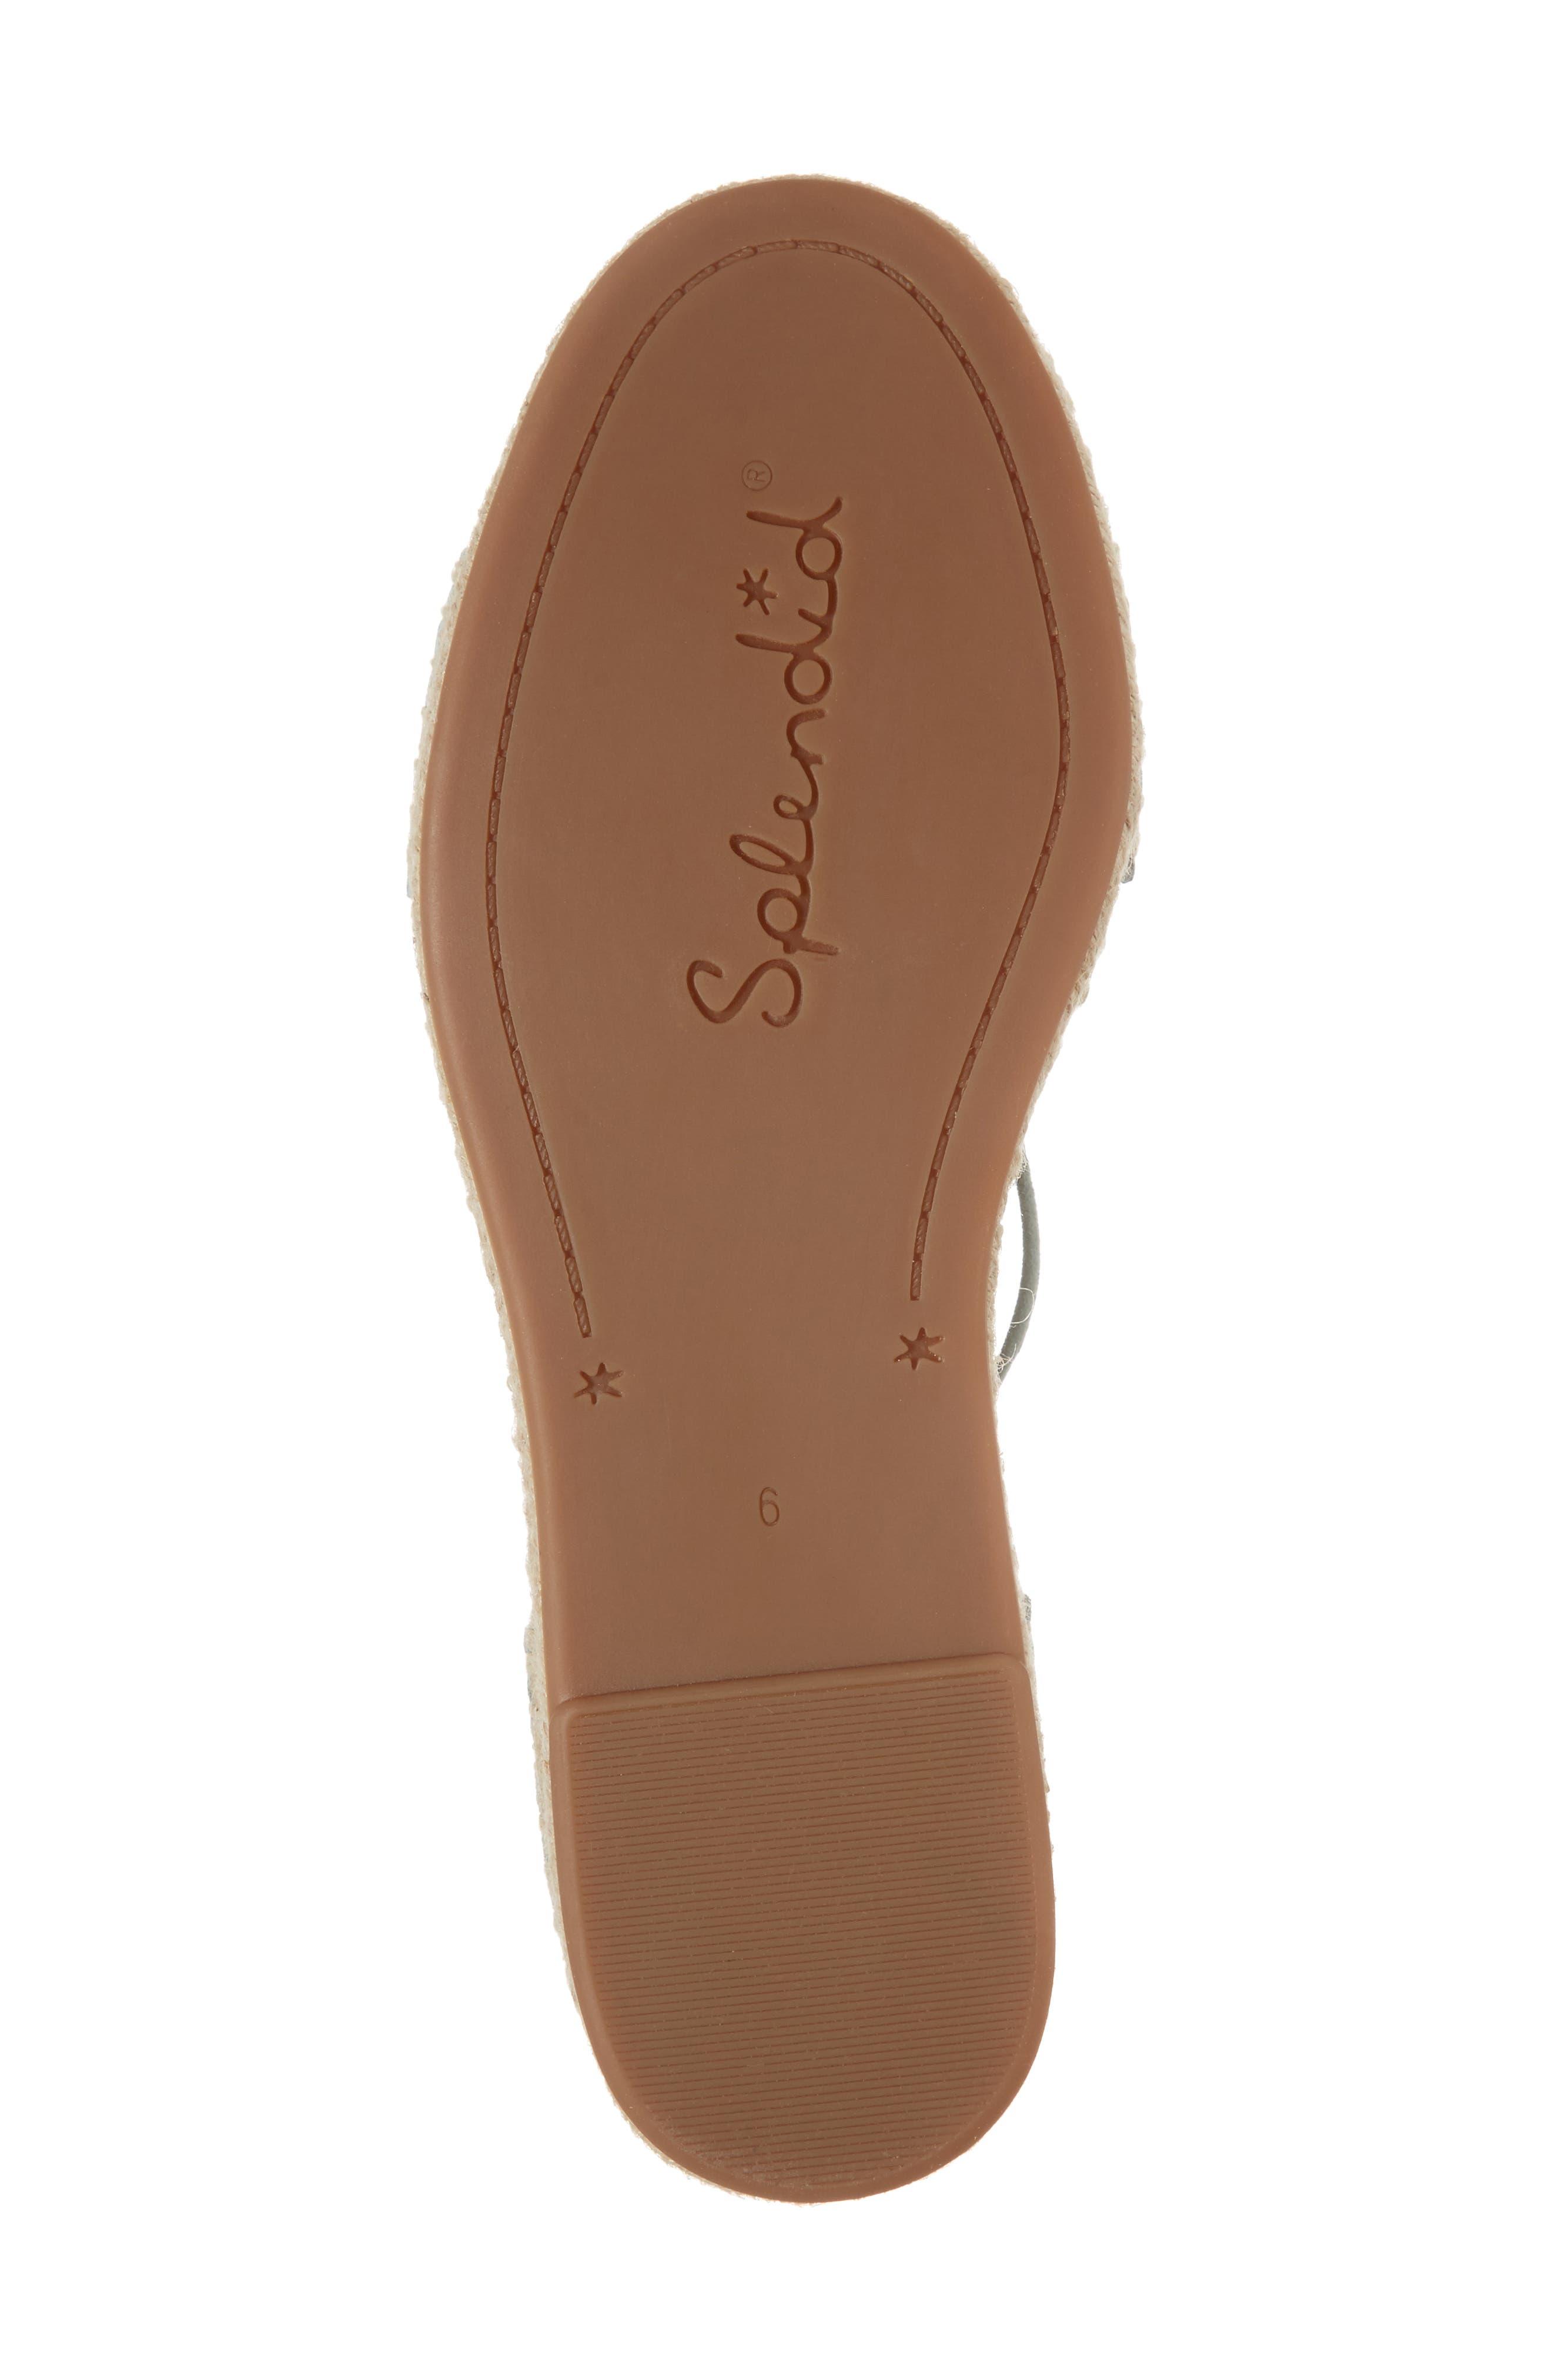 Fernanda Wraparound Platform Sandal,                             Alternate thumbnail 6, color,                             Deco Green Suede